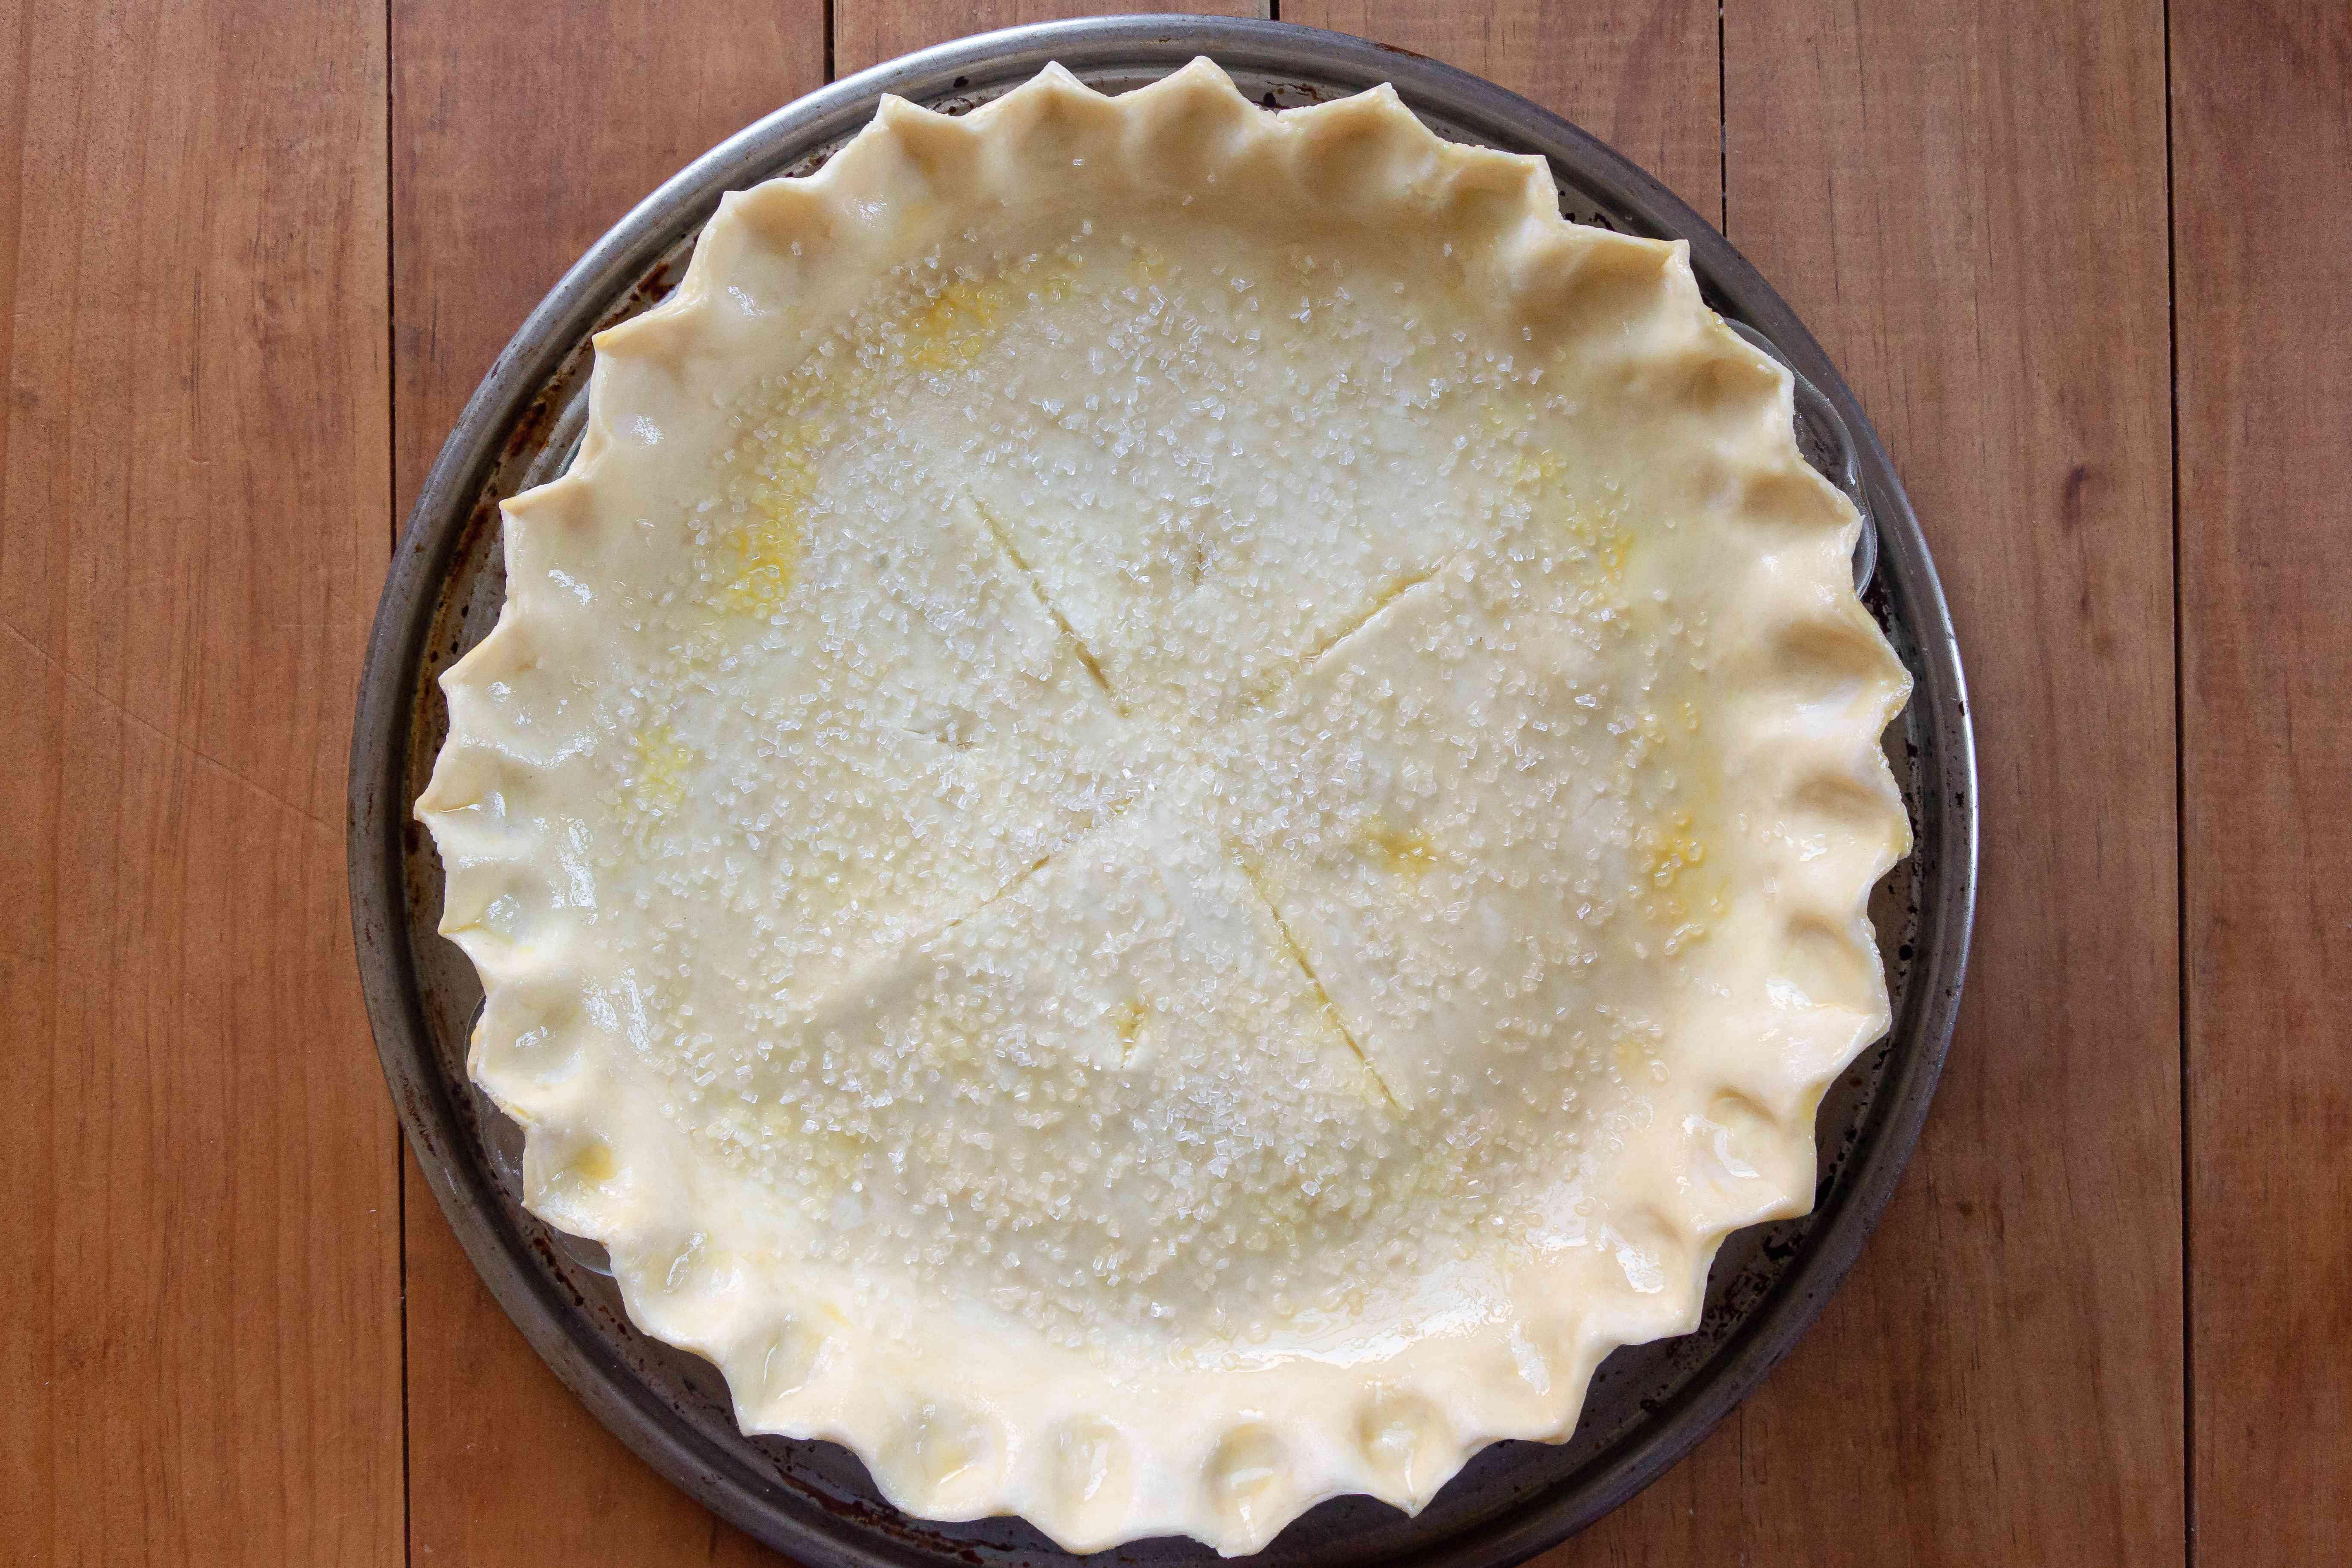 Ohio Lemon Pie ready for the oven.